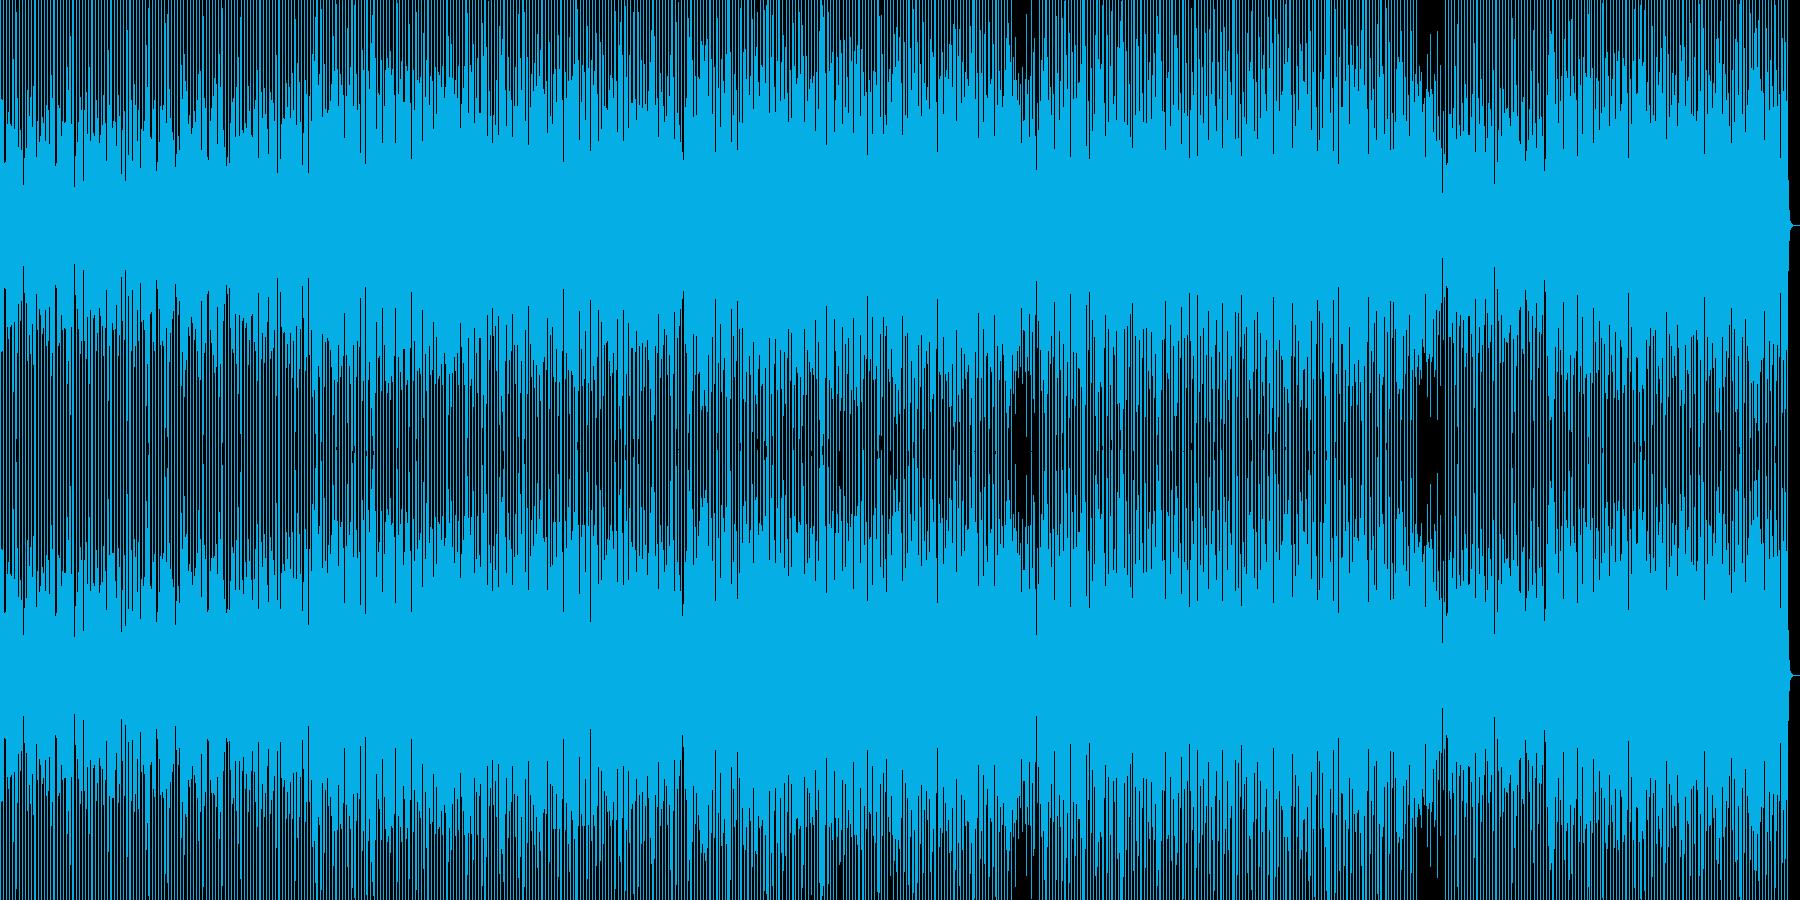 minimal house 21 の再生済みの波形